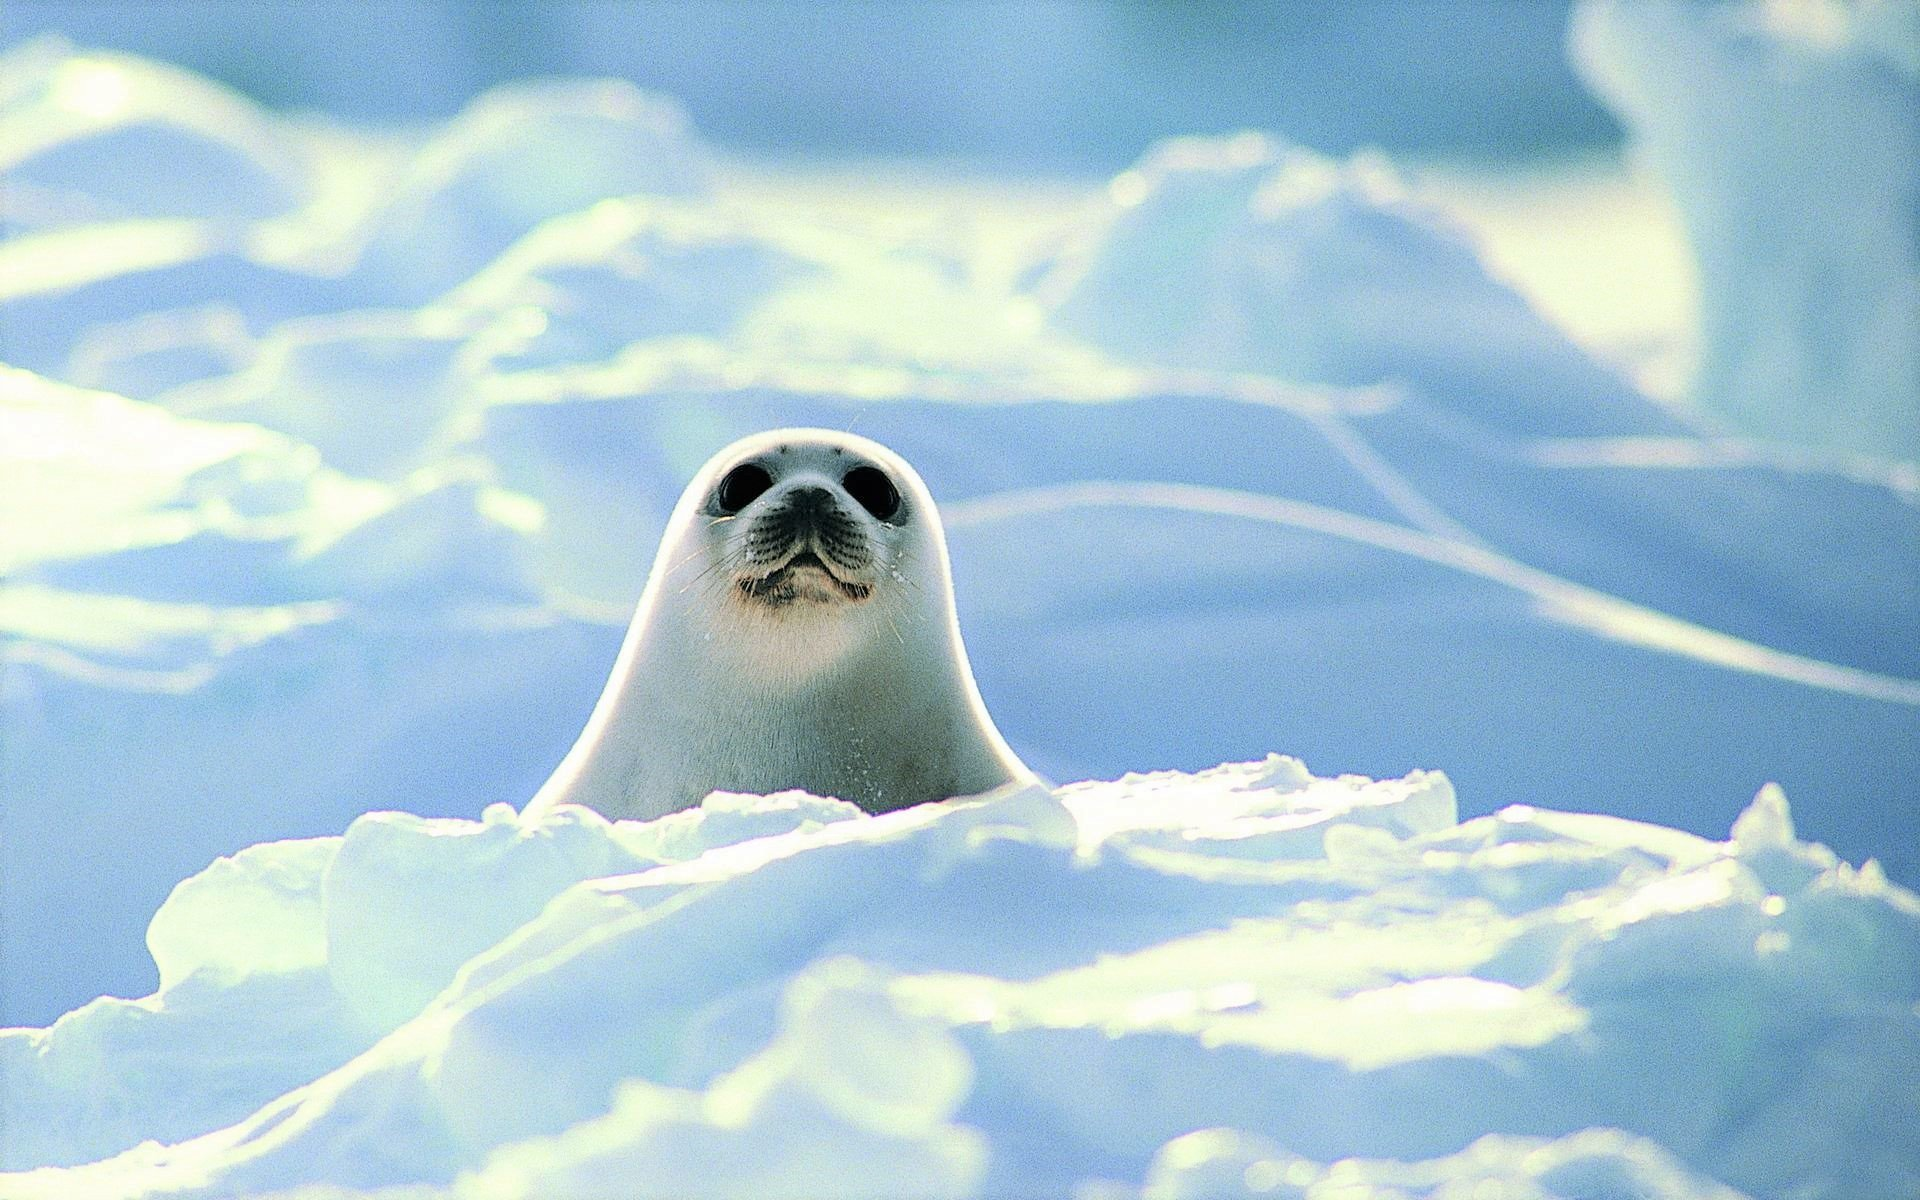 Cute Baby Seals 9361 Hd Wallpapers: Cute Harp Seal Pup HD Wallpaper